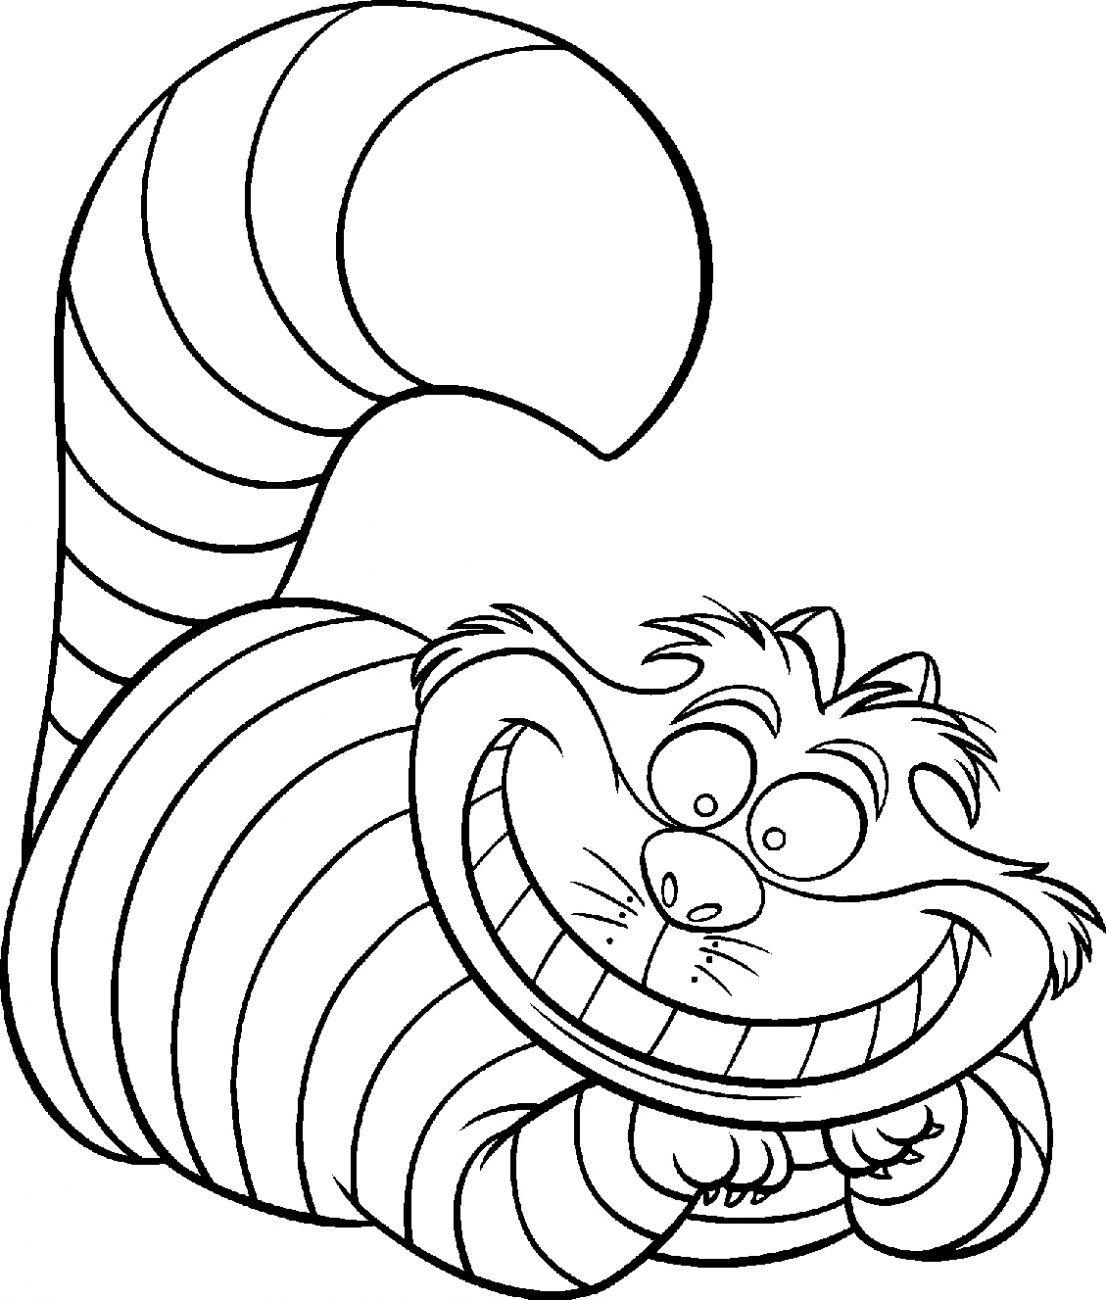 Dibujo Infantil De Cheshire Para Colorear Con Imagenes Gatito